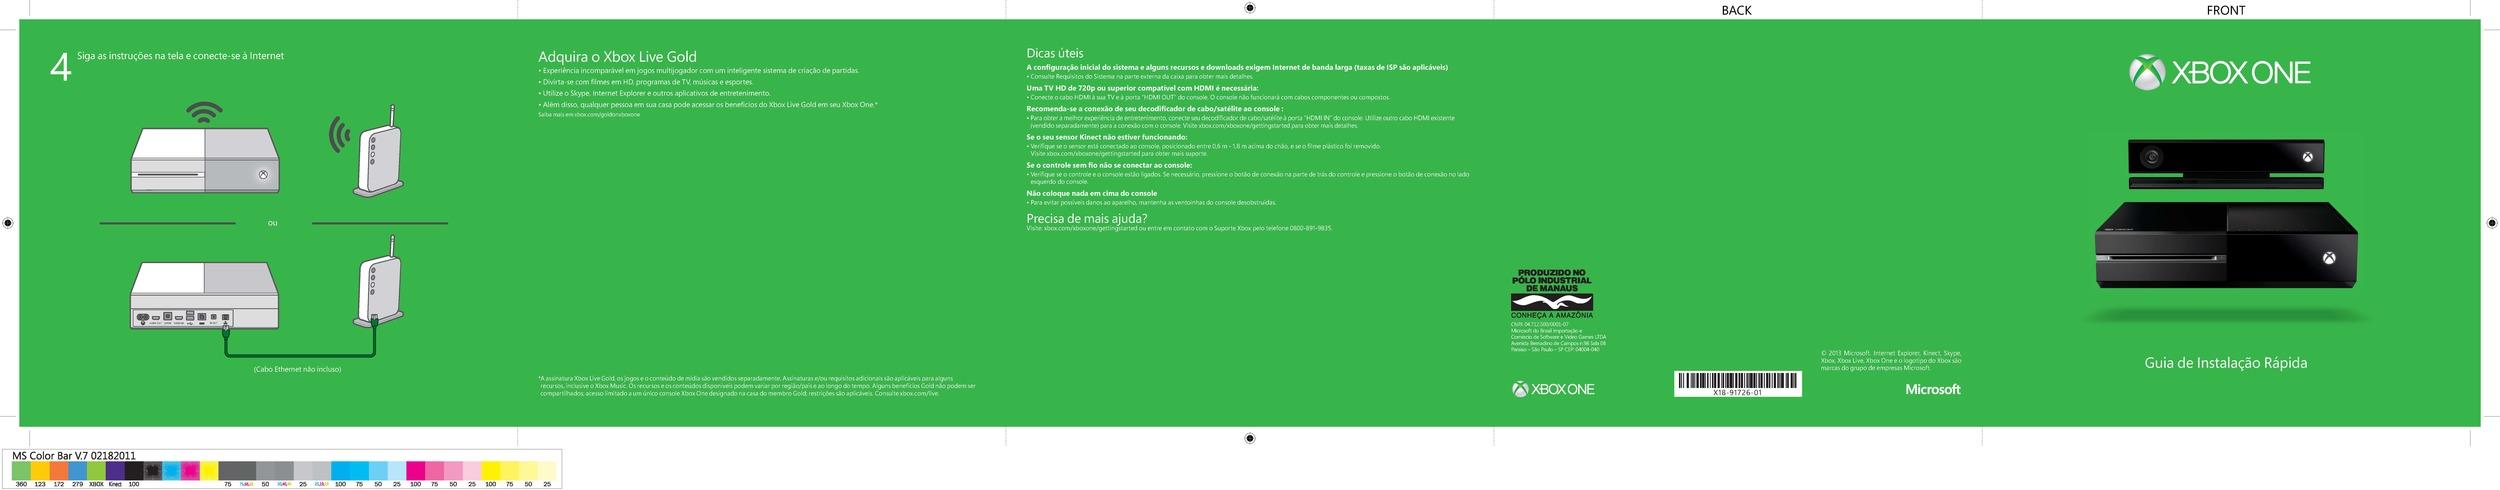 manual_xboxone_Page_1.jpg